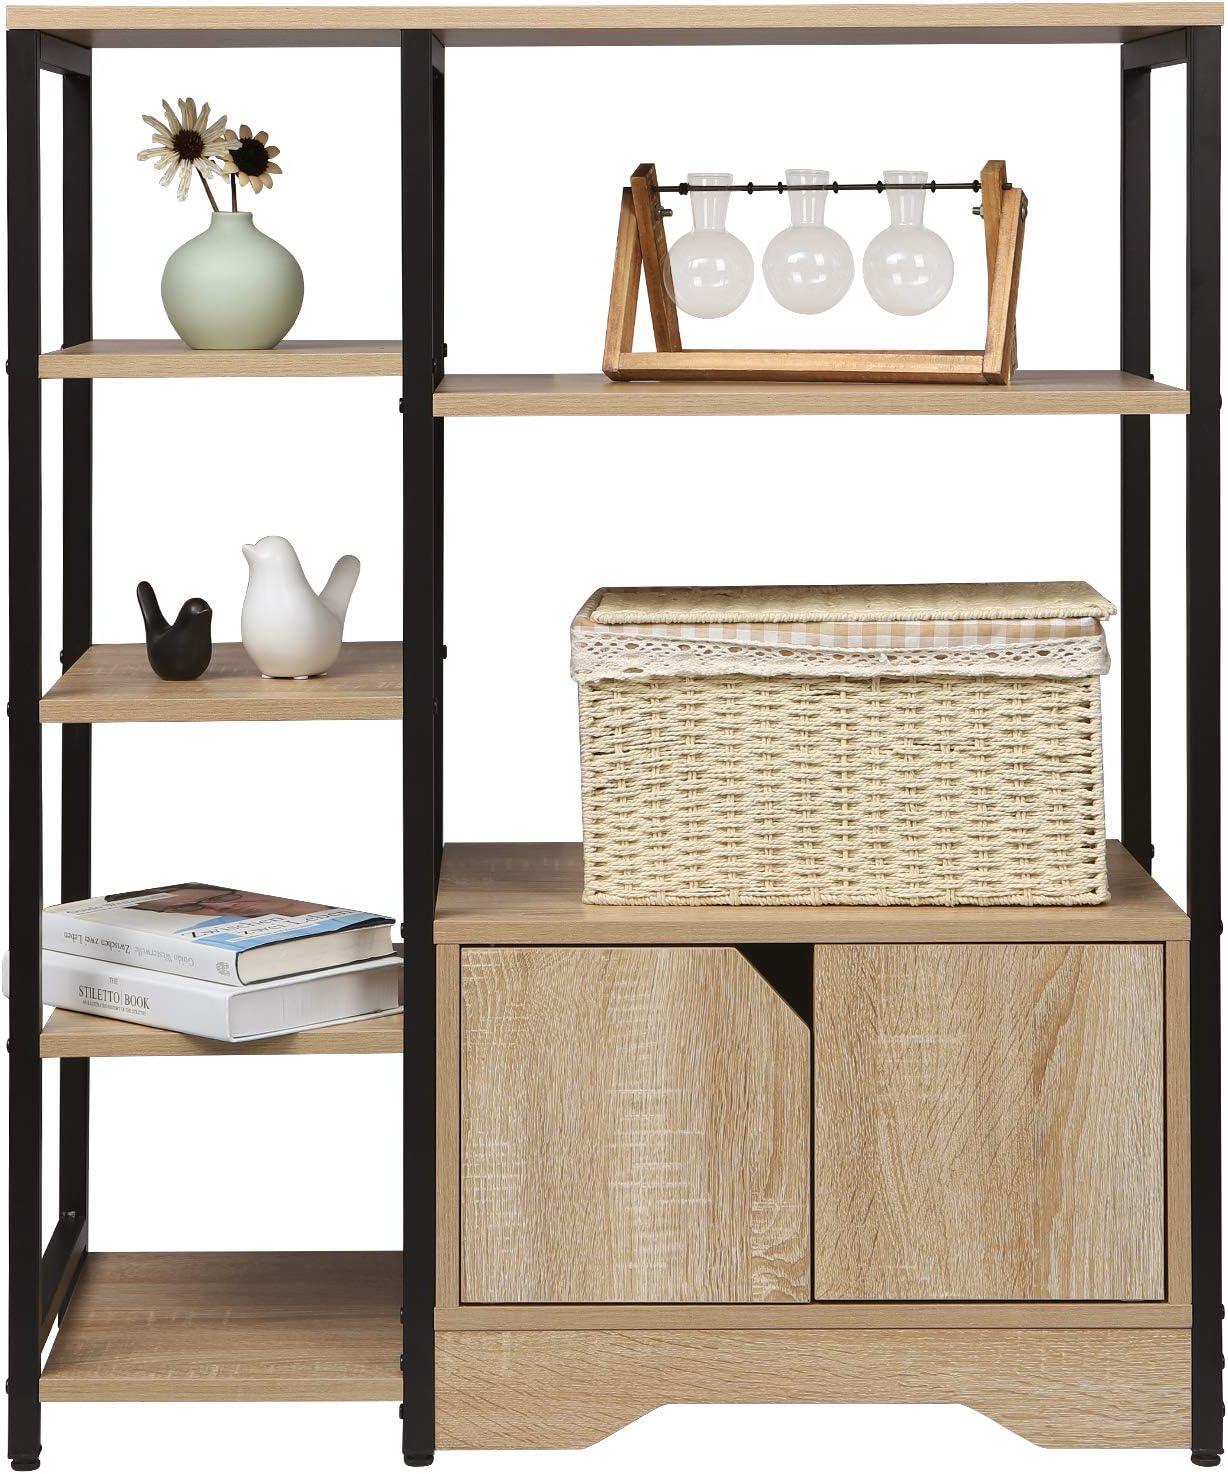 Light Oak Corner Bookcase Wooden for Living Room,Office,Bedroom,Bathroom WOLTU Bookcase 6 Tier Book Shelves Display Storage Rack Standing Shelf Unit with One Drawer